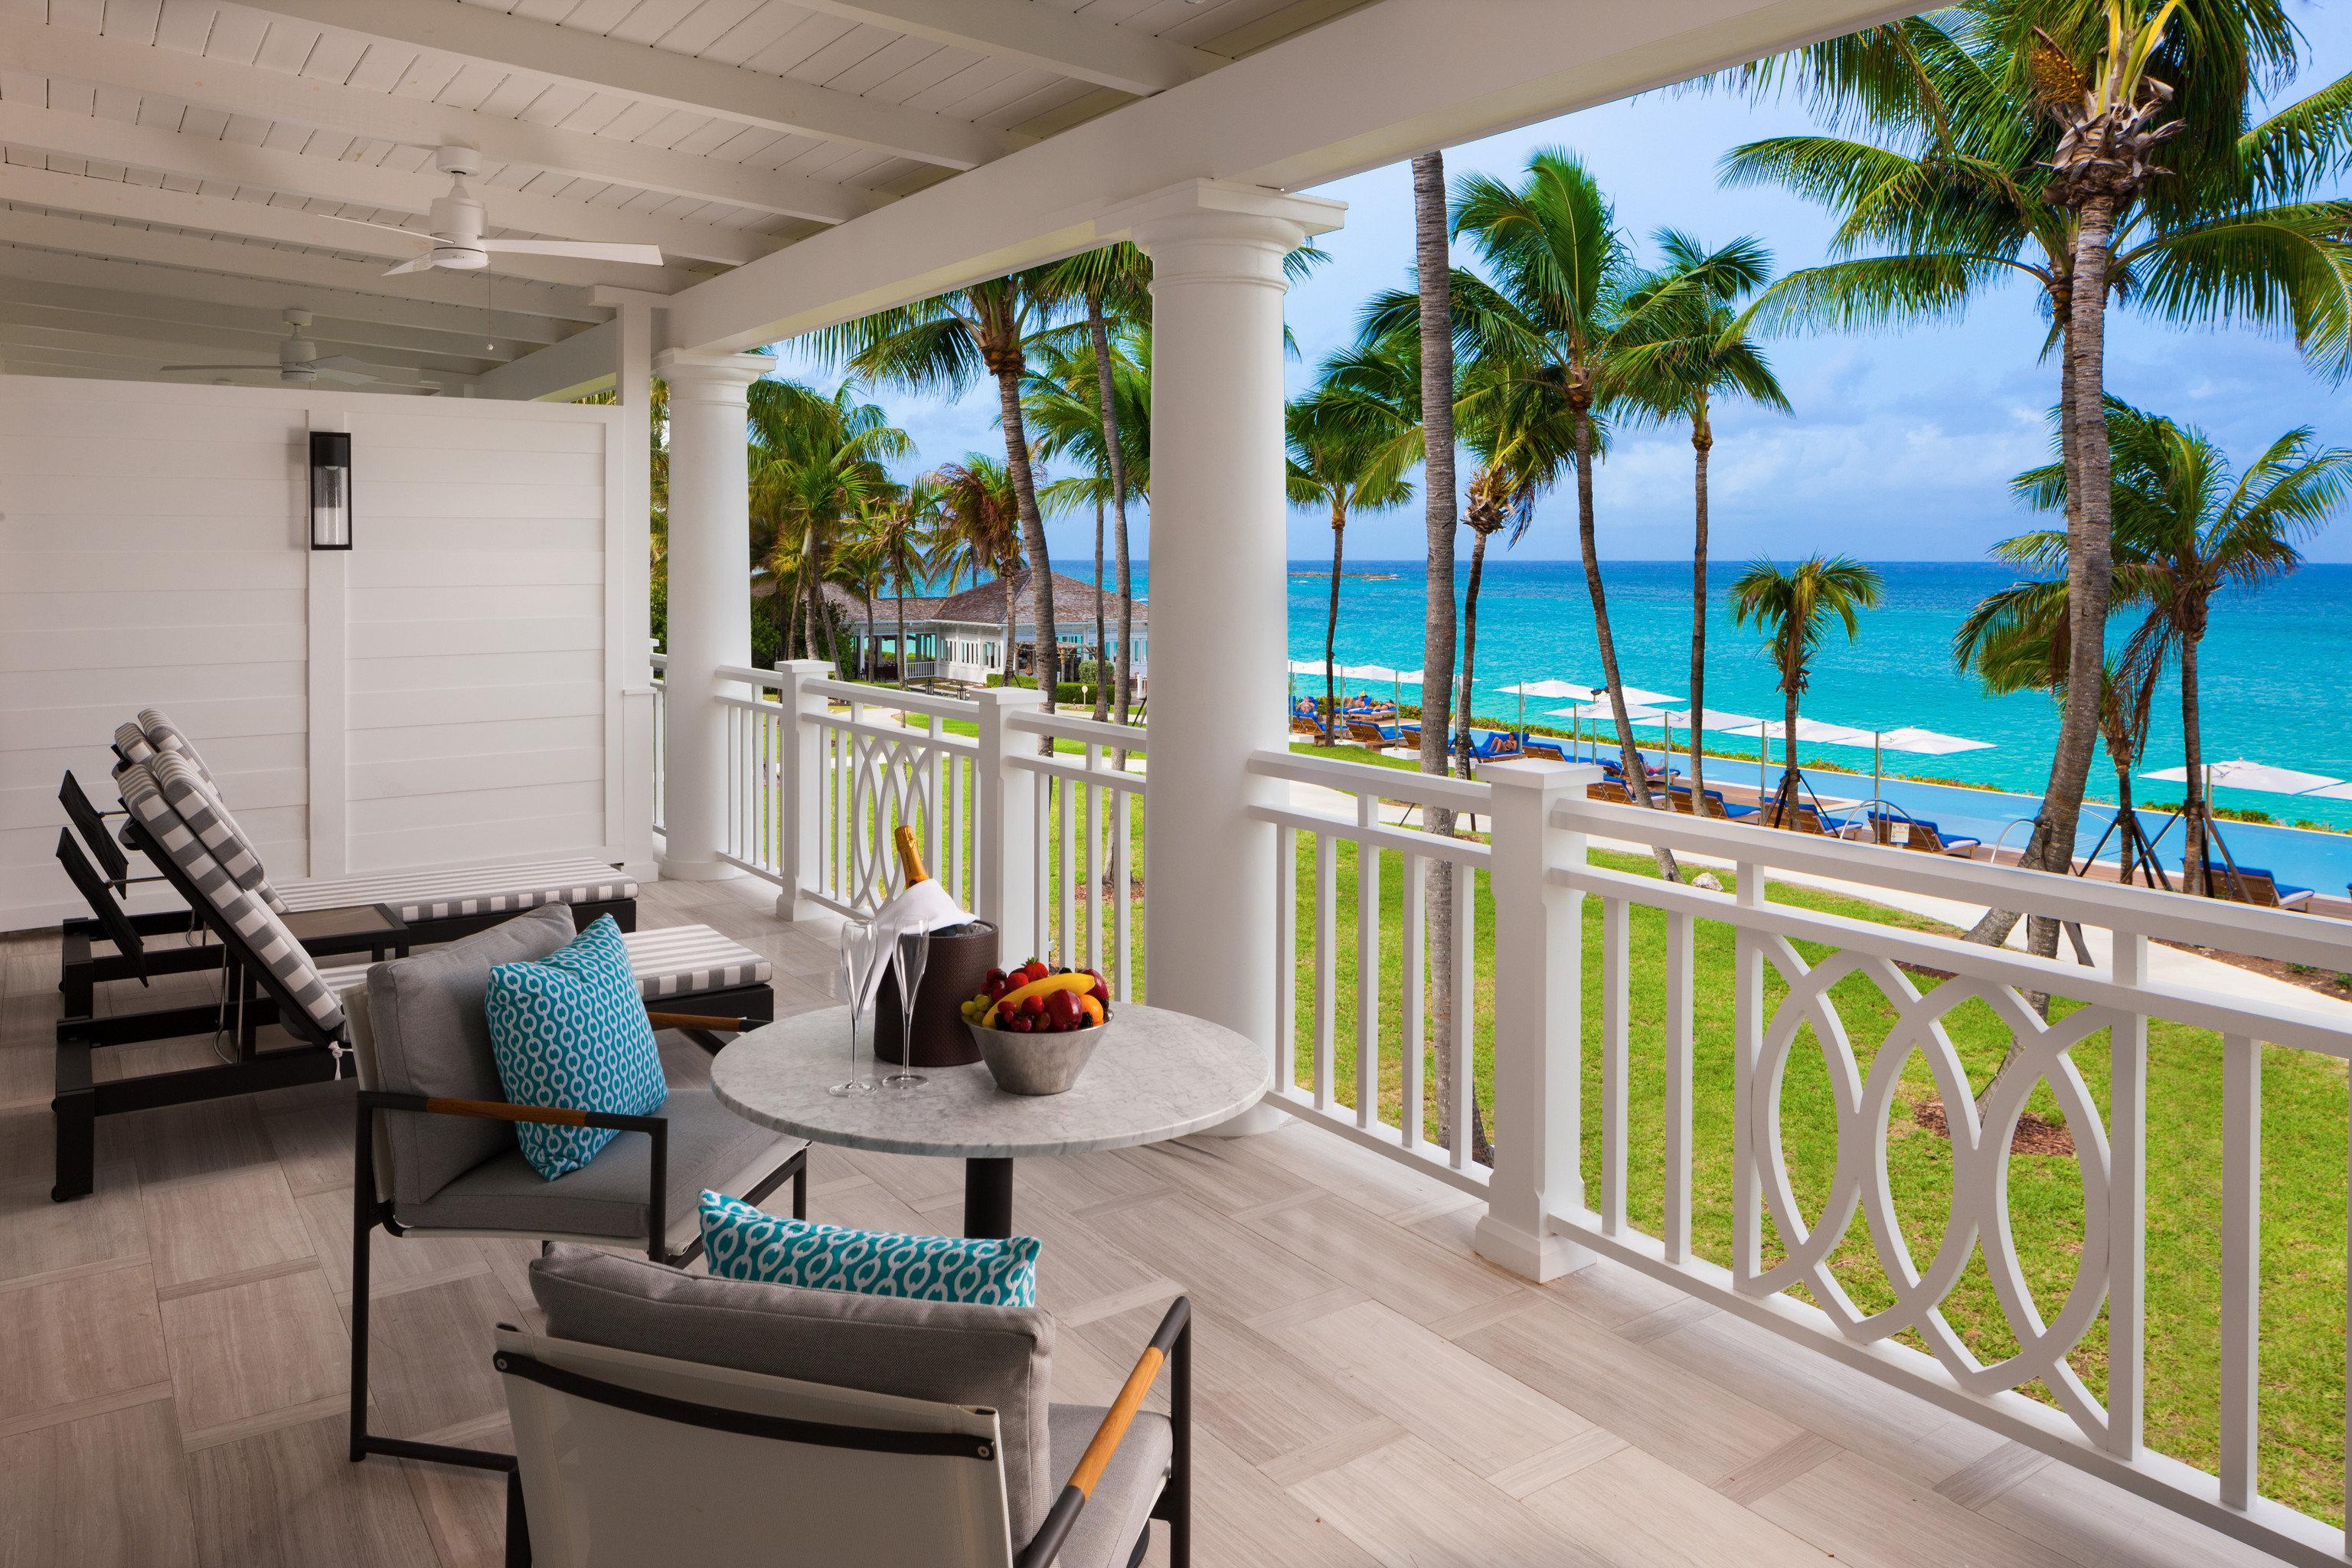 Hotels building property porch home house condominium Villa Resort cottage caribbean overlooking Deck